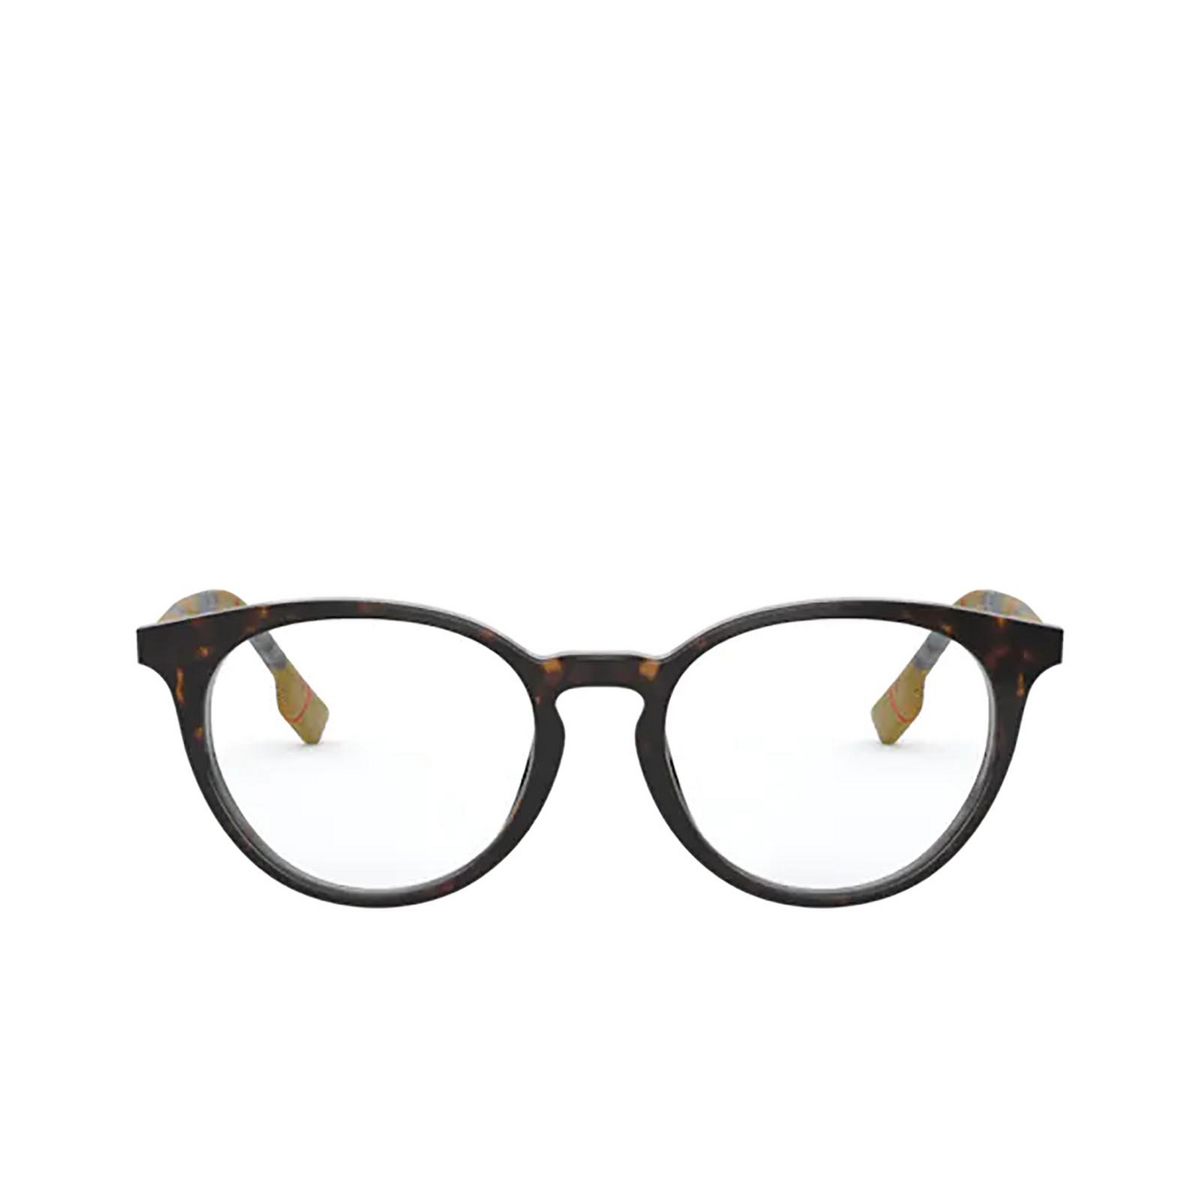 Burberry® Round Eyeglasses: Chalcot BE2318 color Dark Havana 3854 - front view.